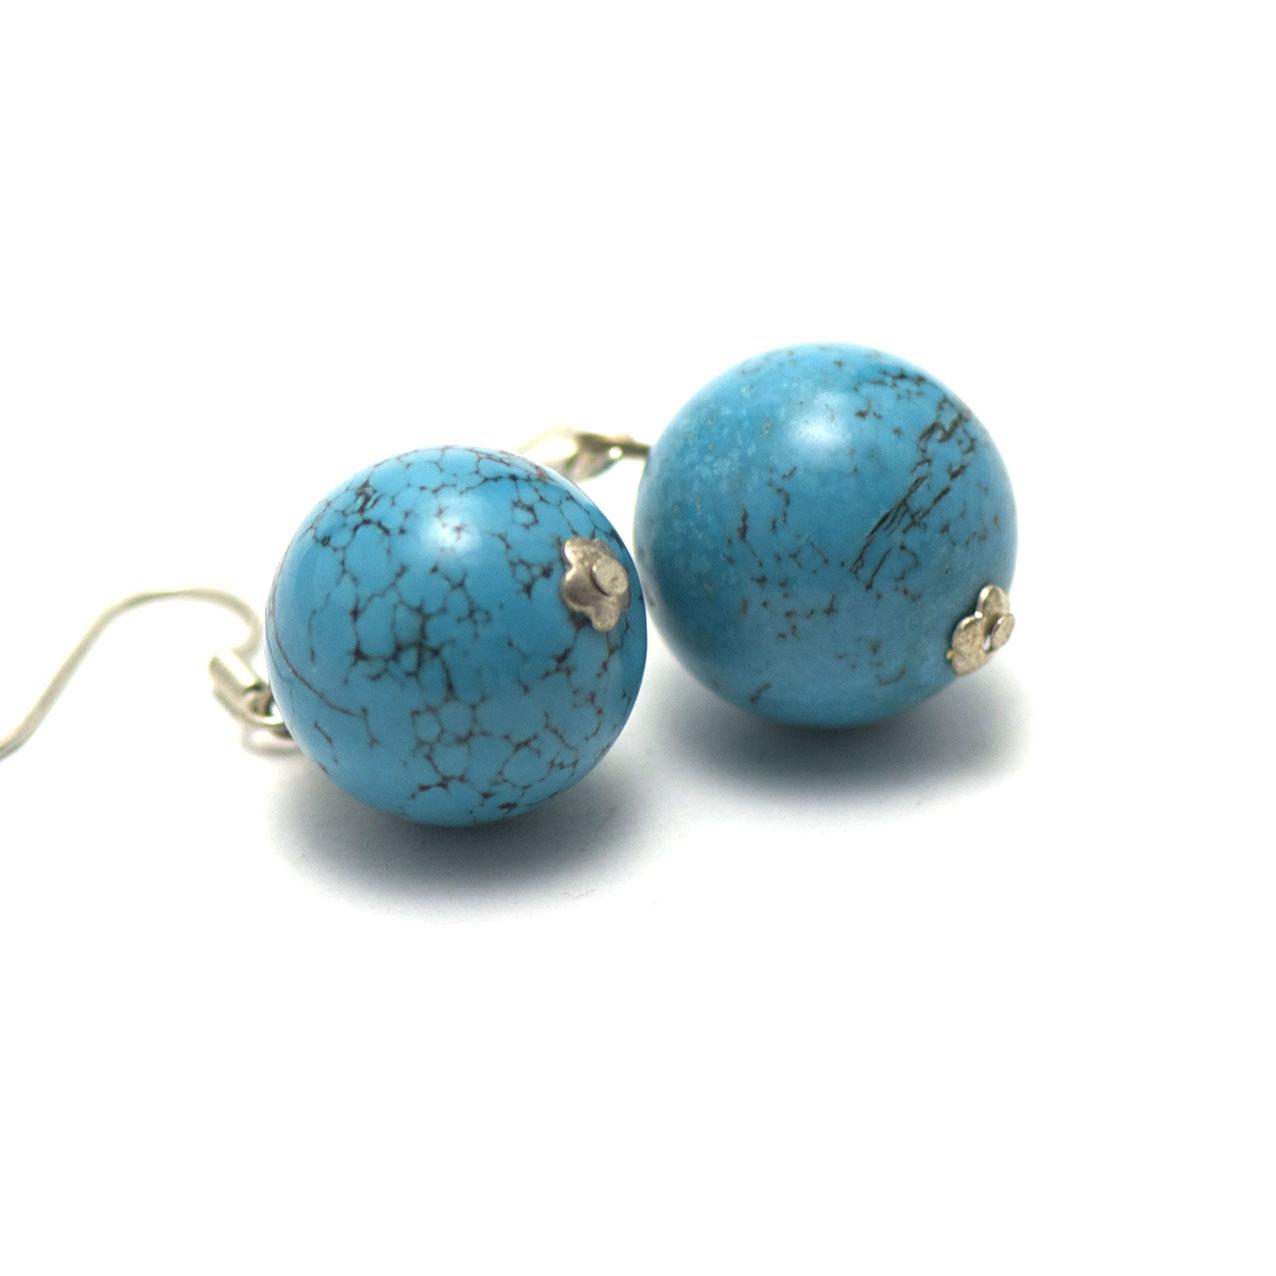 boucle d 39 oreille turquoise perle ronde 14 mm boucle d 39 oreille turquoise miracles min raux. Black Bedroom Furniture Sets. Home Design Ideas